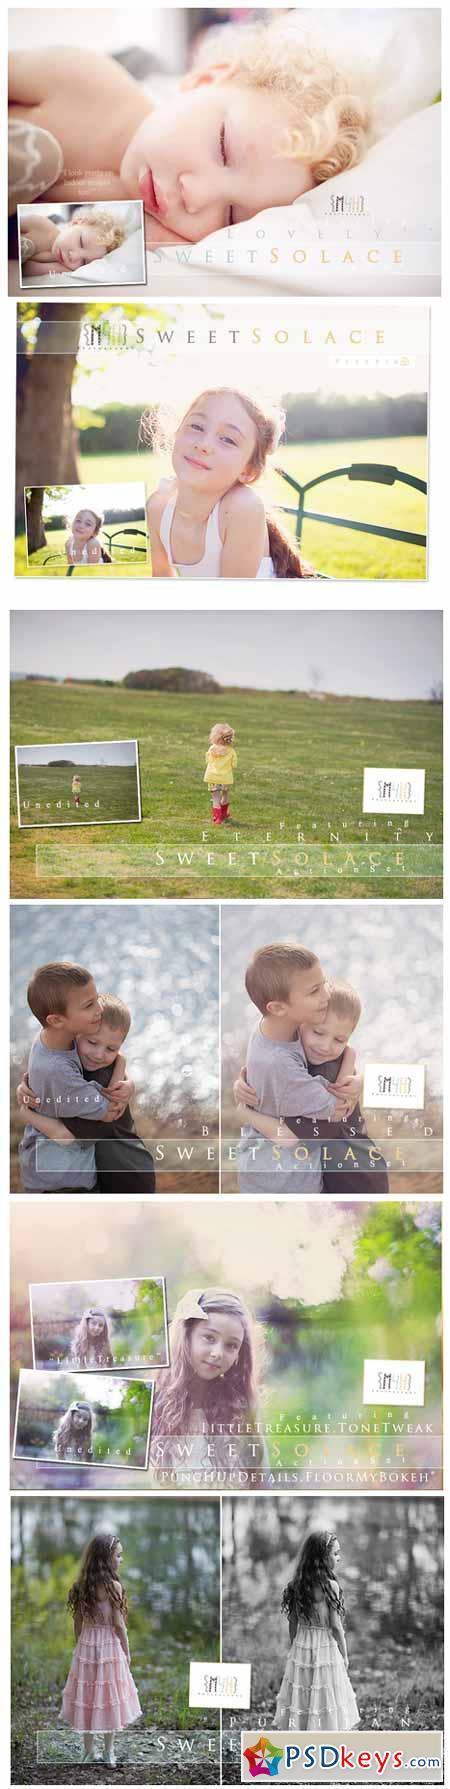 m4h photography - jubilee lightroom presets